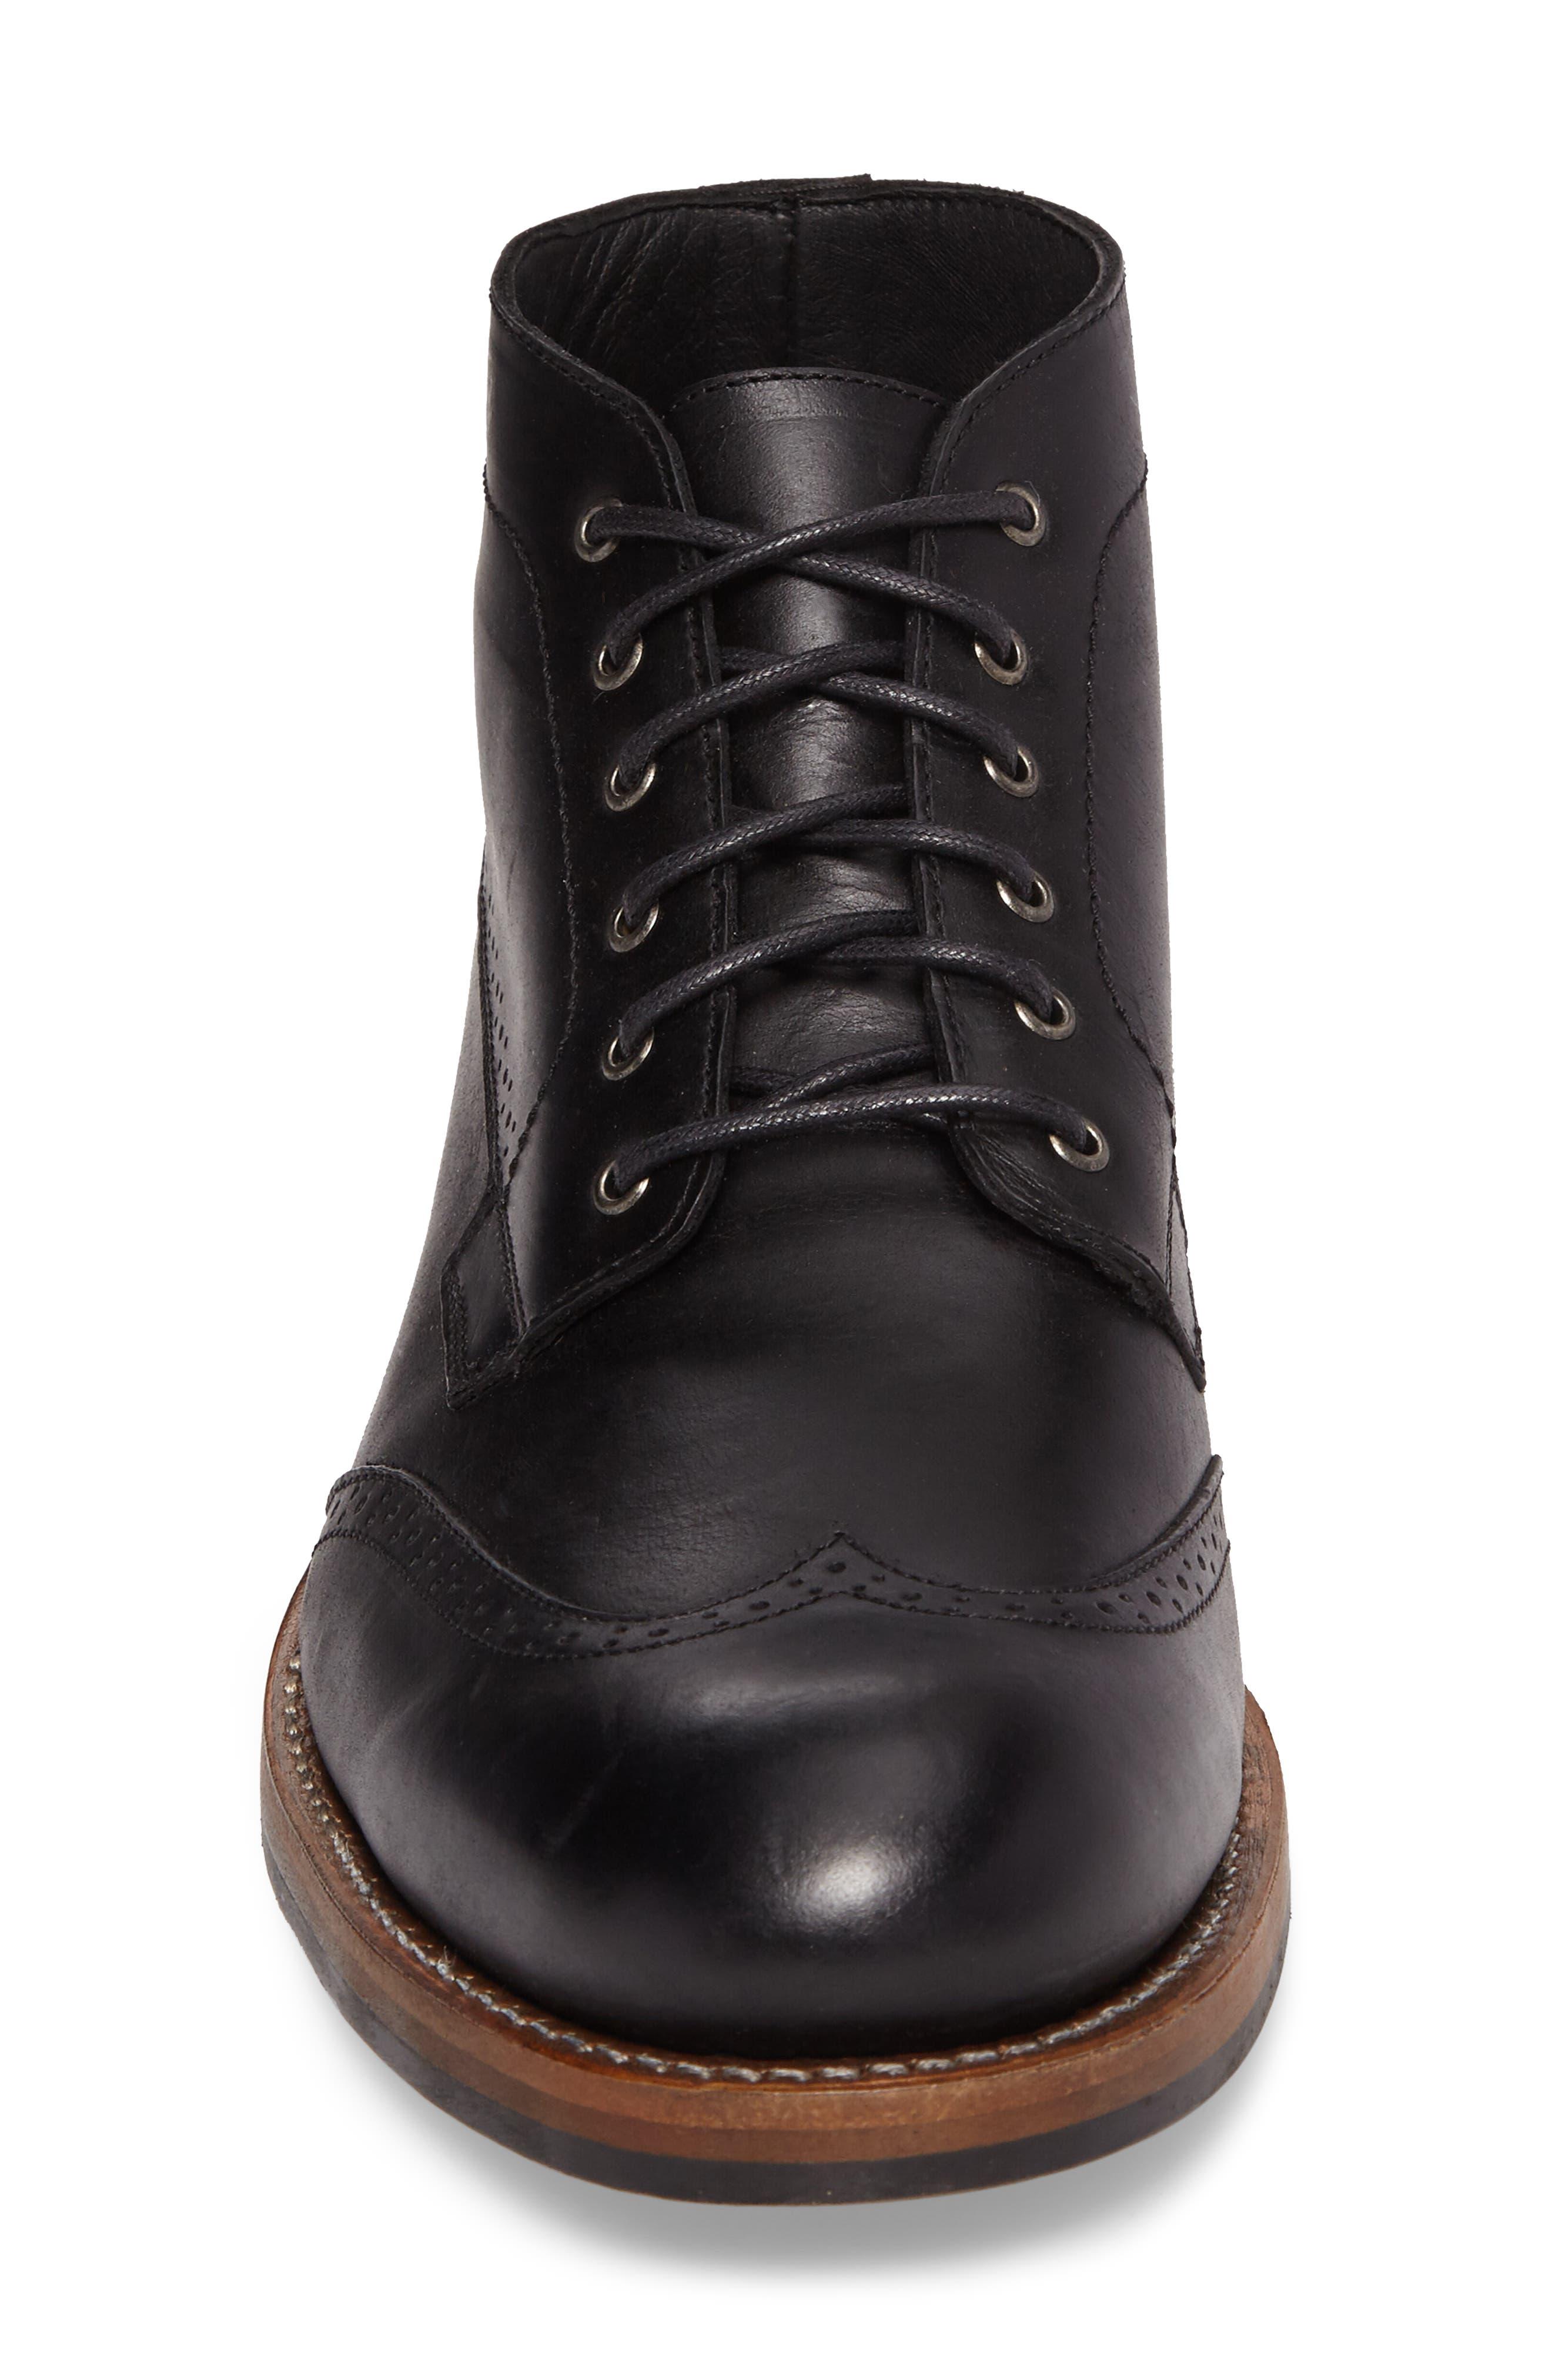 Harwell Wingtip Boot,                             Alternate thumbnail 4, color,                             Black